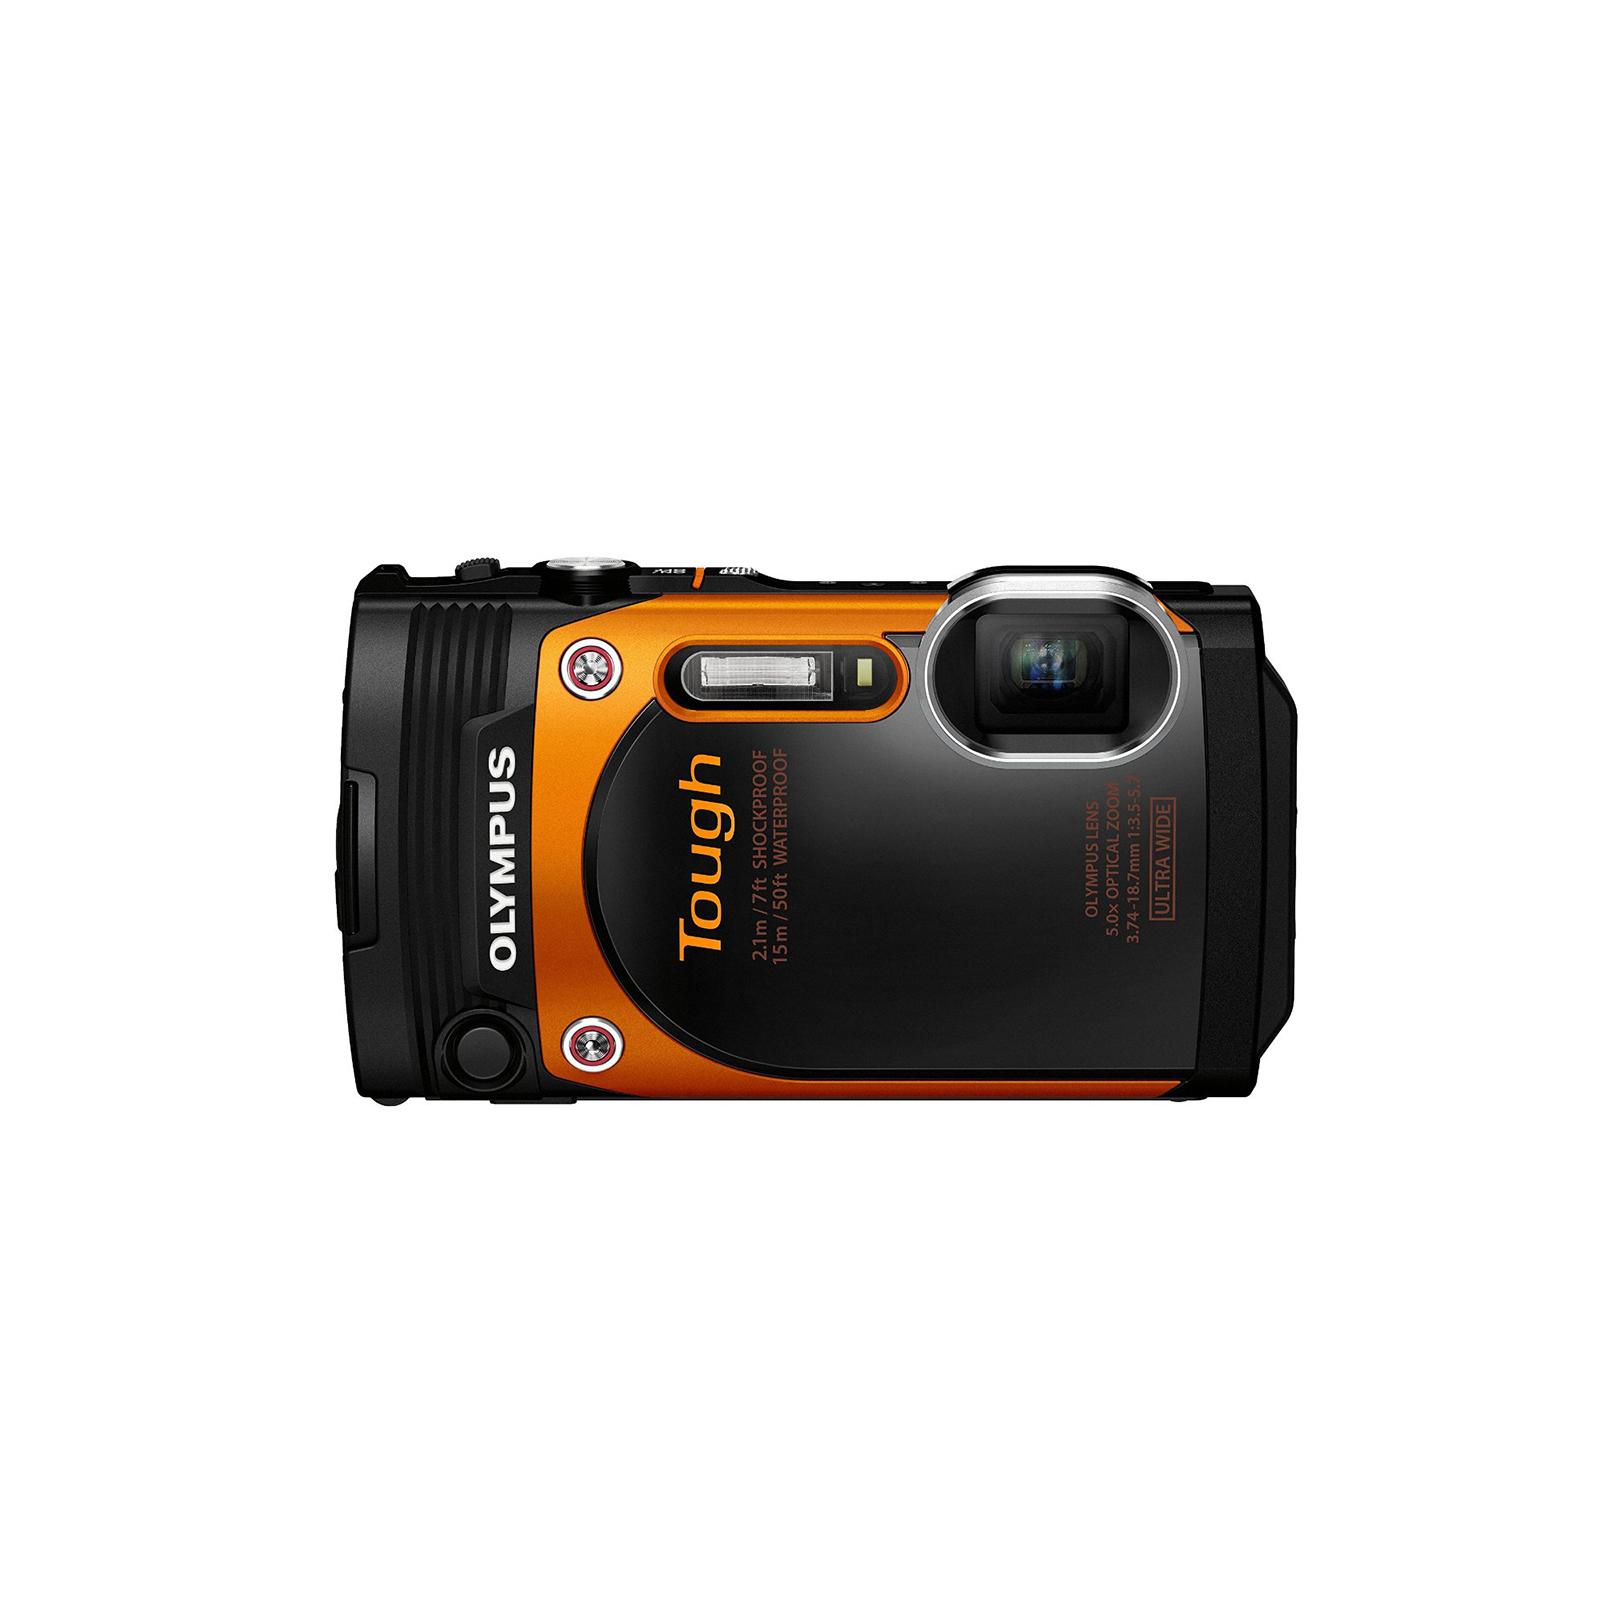 Цифровой фотоаппарат OLYMPUS TG-860 Orange (Waterproof - 15m; iHS; Wi-Fi) (V104170OE000) изображение 2